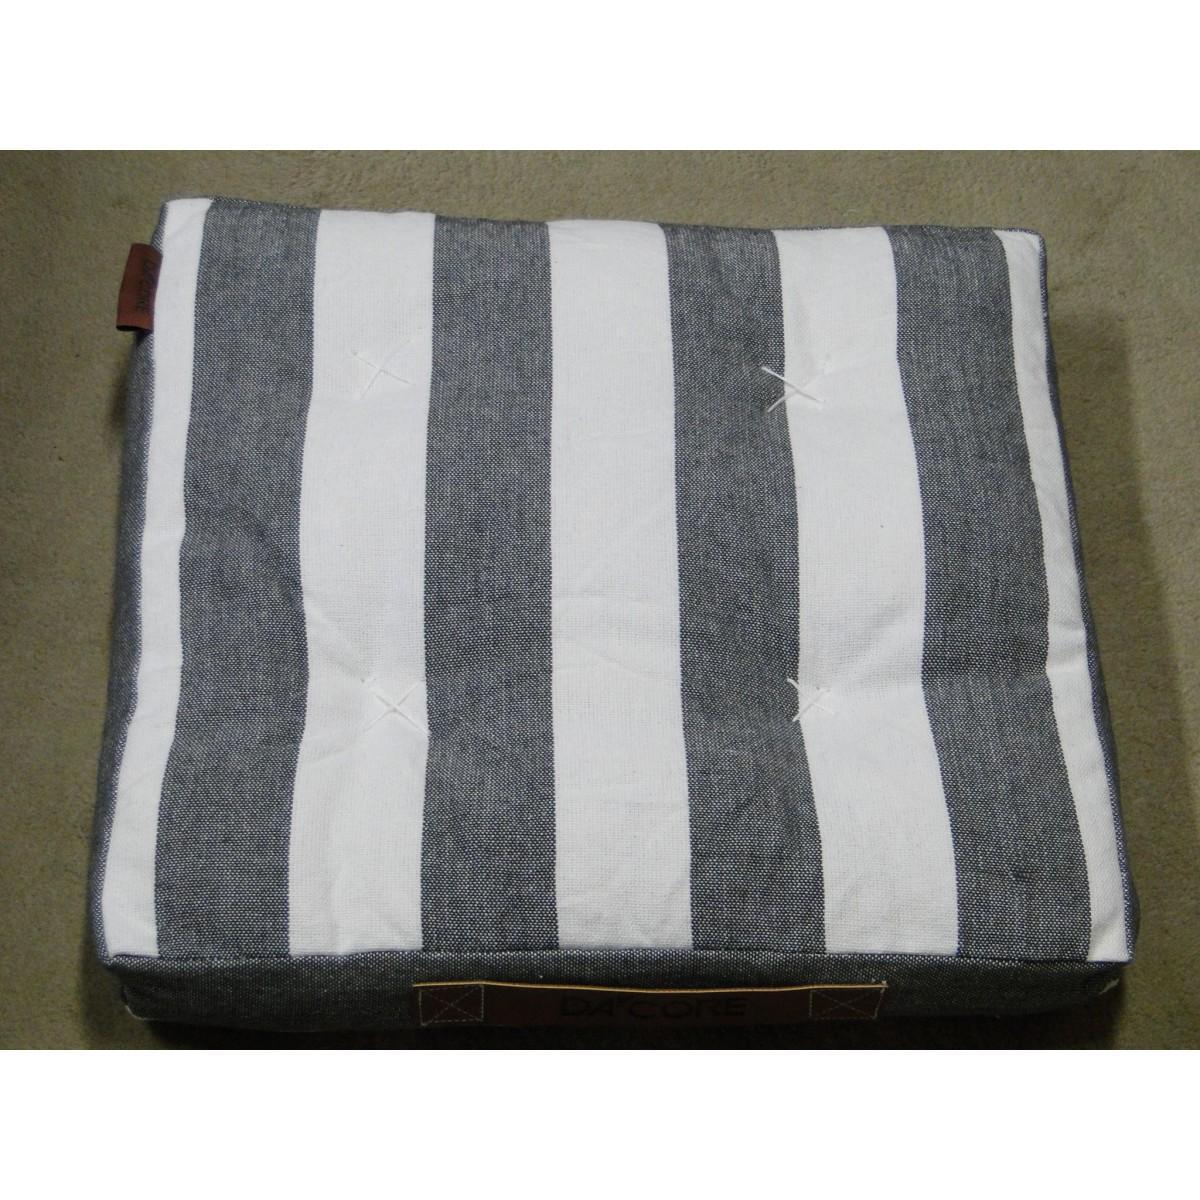 DACORE Boxhynde m/læder håndtag grå stribet